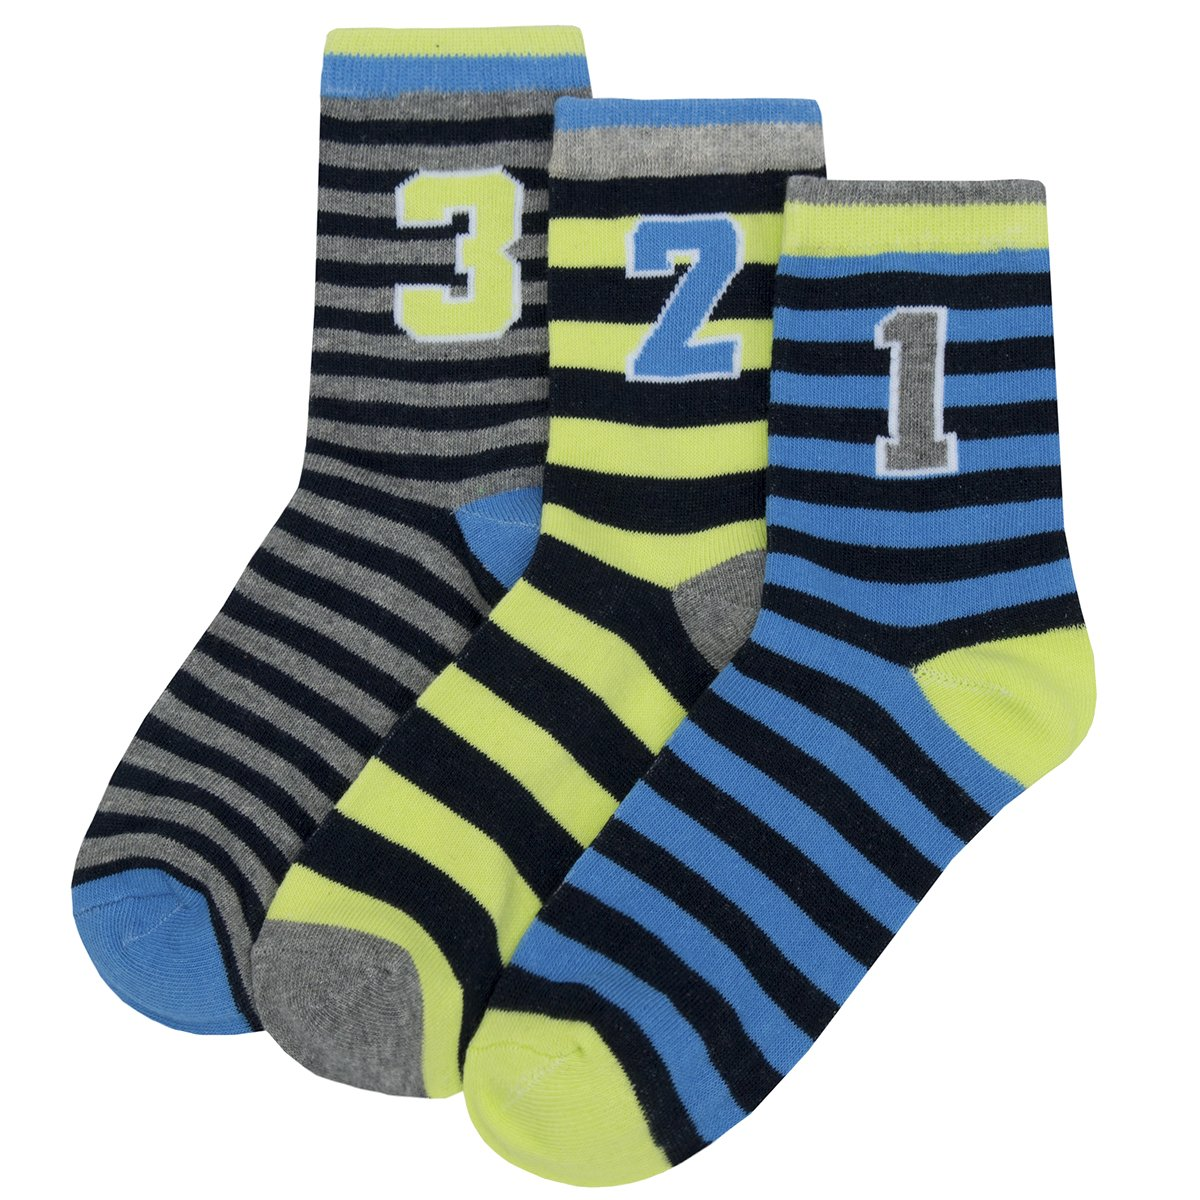 Zest Boys Cotton Rich Socks